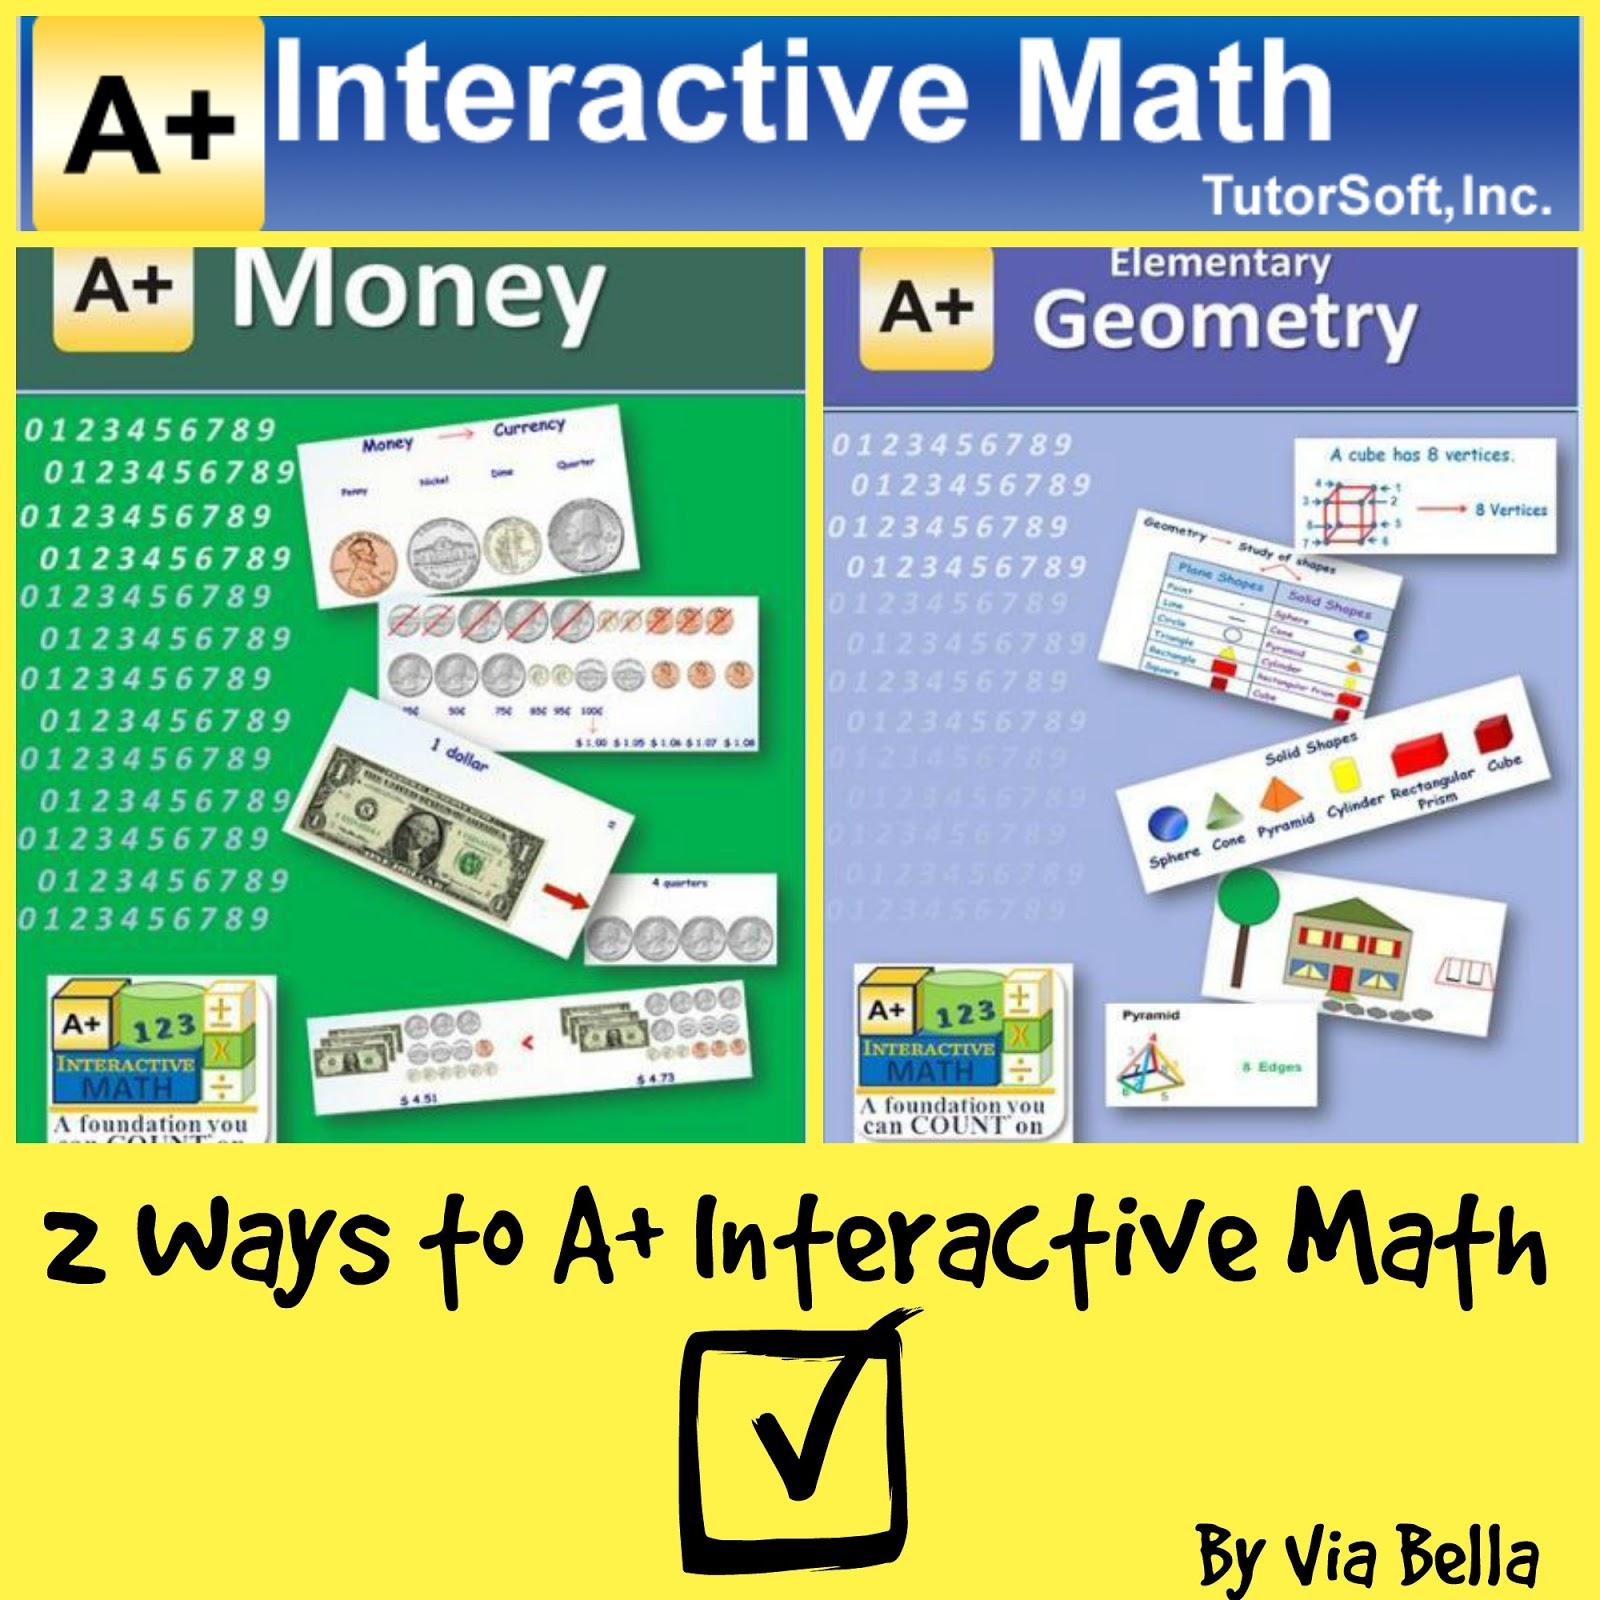 math worksheet : free interactive math lessons online  educational math activities : Interactive Math Worksheets